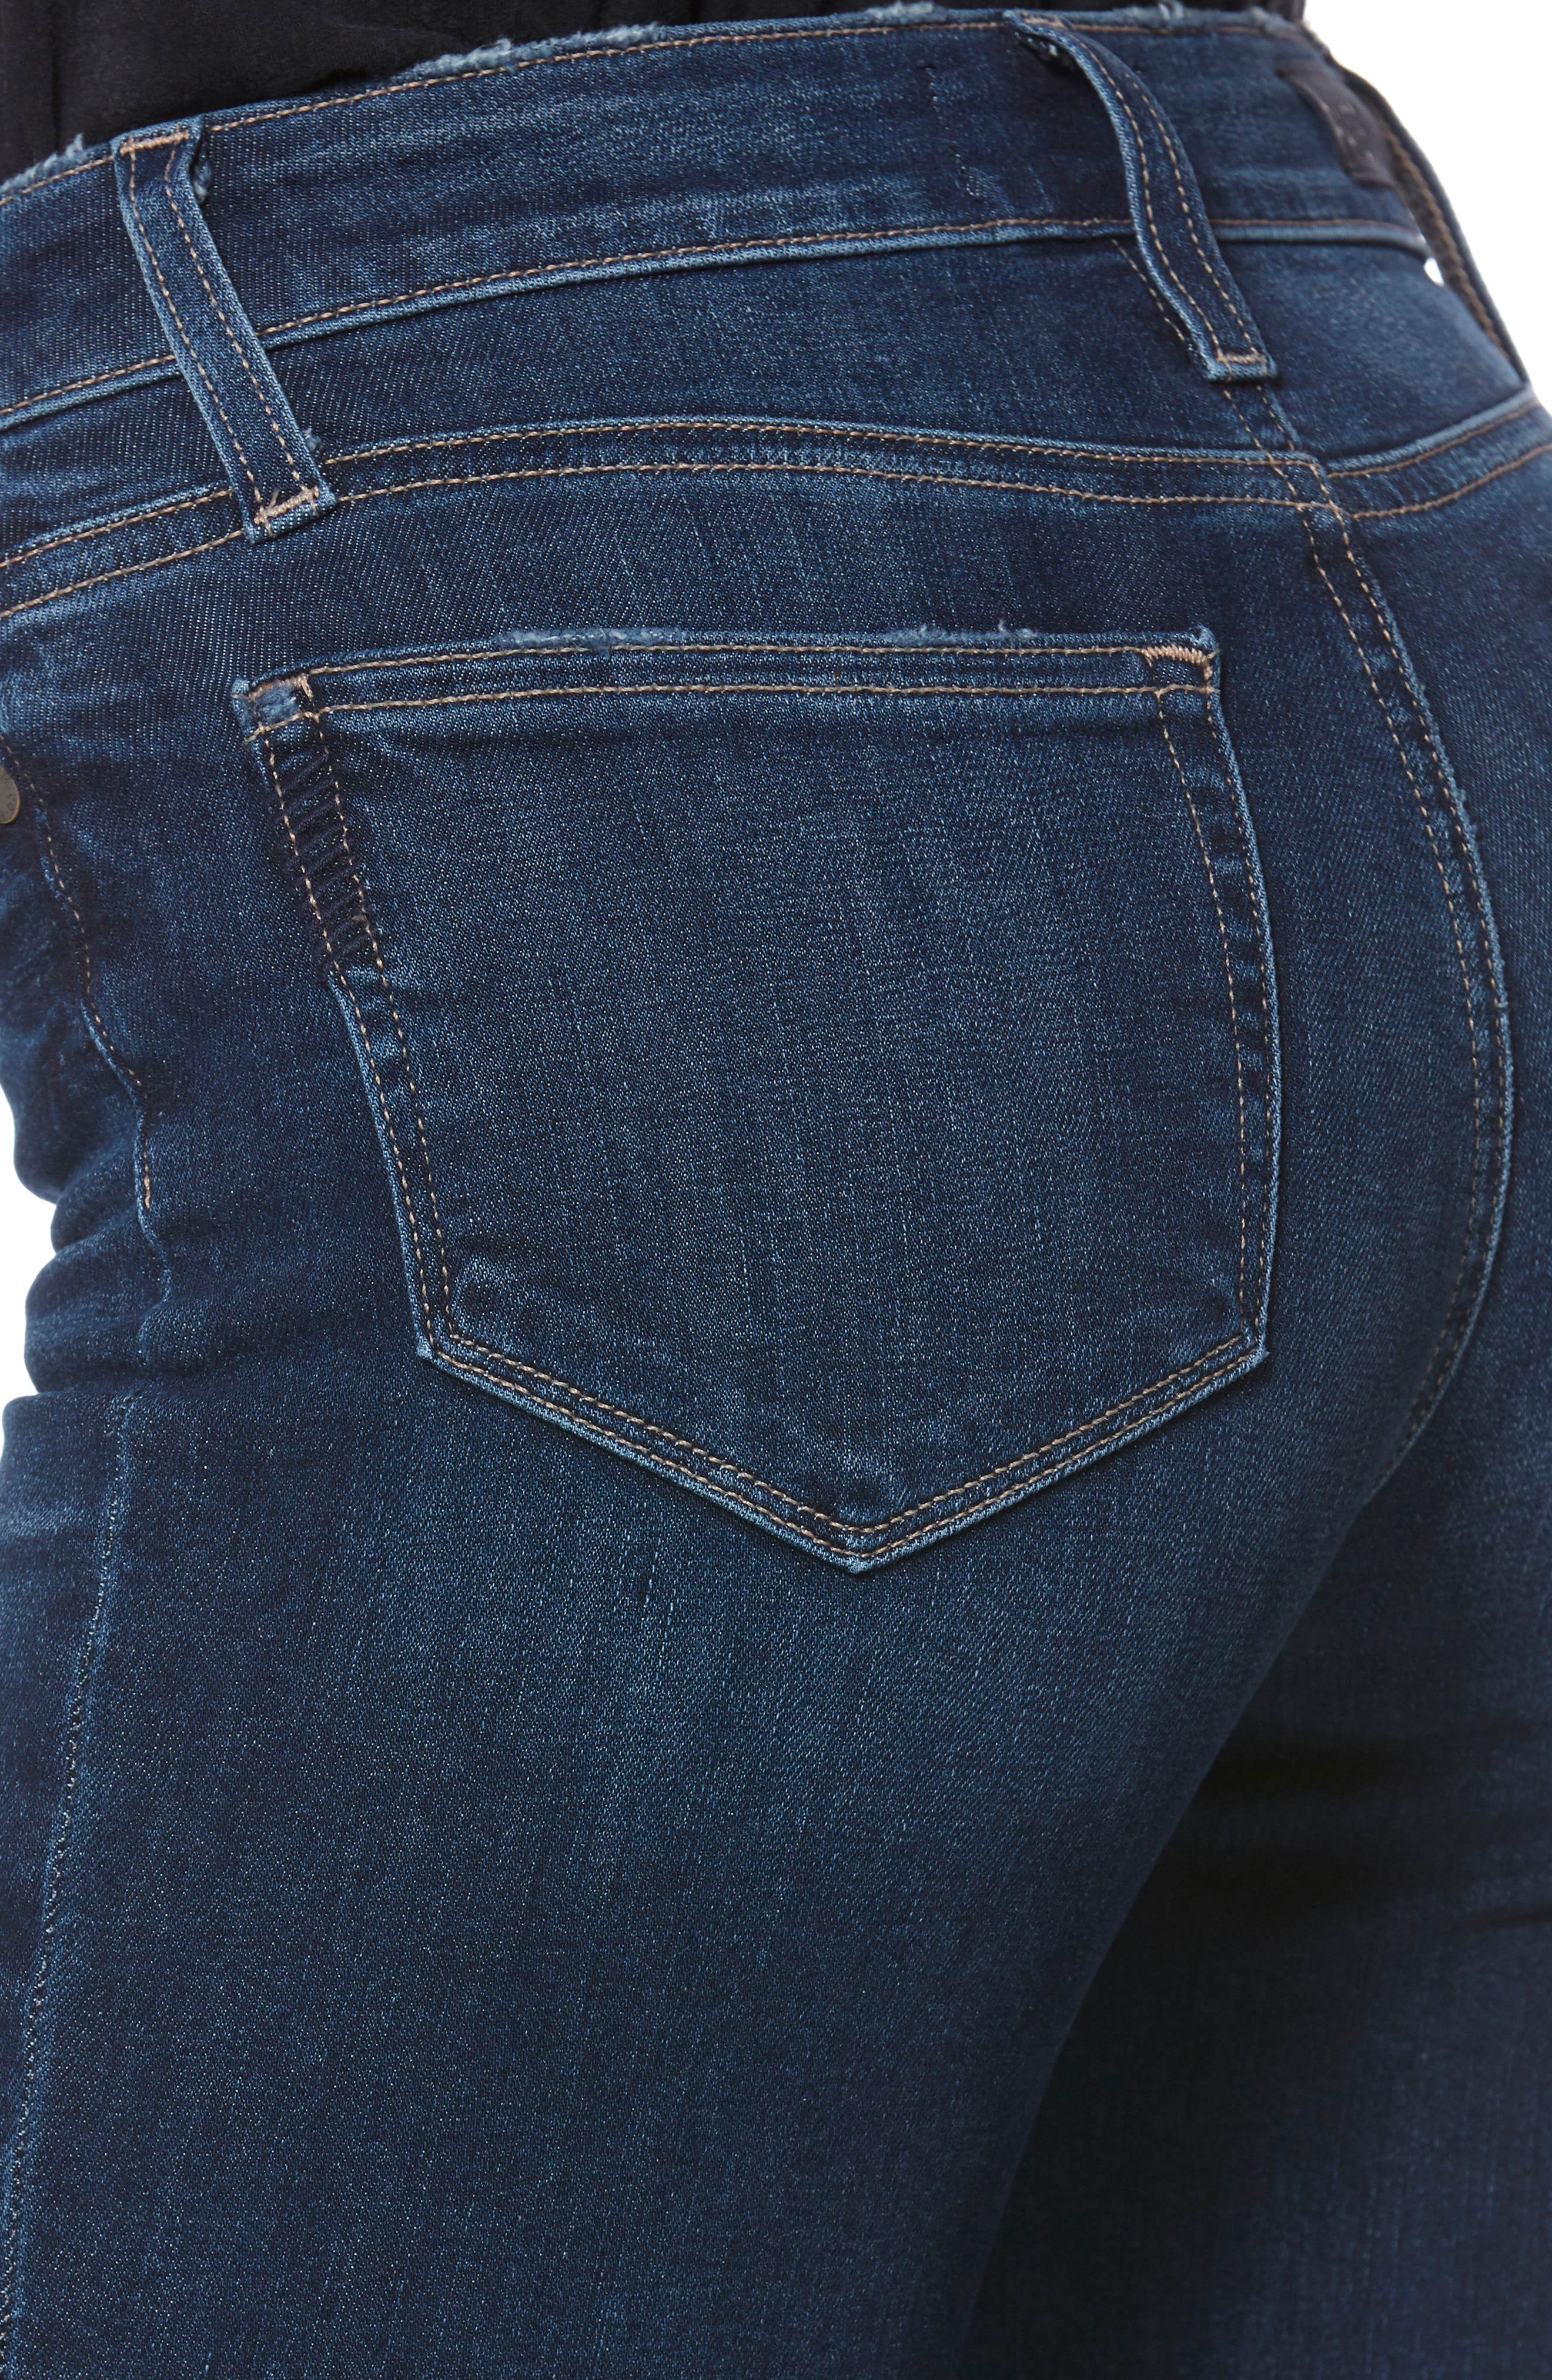 PAIGE,                             Transcend Vintage - Colette Frayed Crop Flare Jeans,                             Alternate thumbnail 6, color,                             PALMA